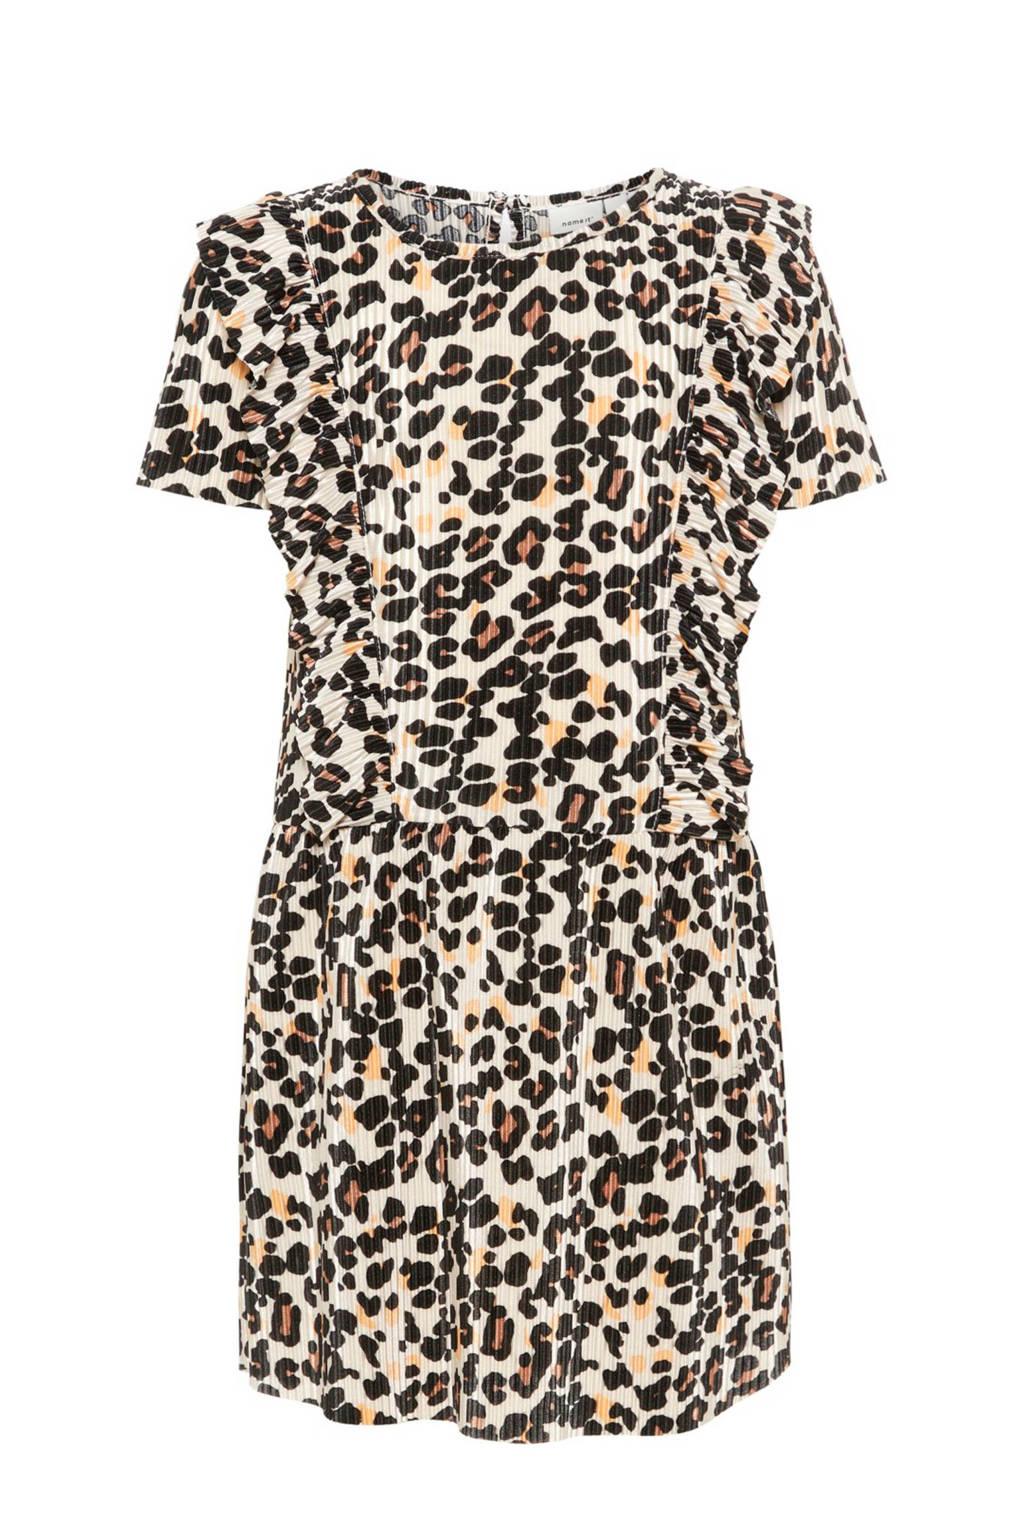 name it MINI jurk Fleo met panterprint, Creme/ zand/ zwart